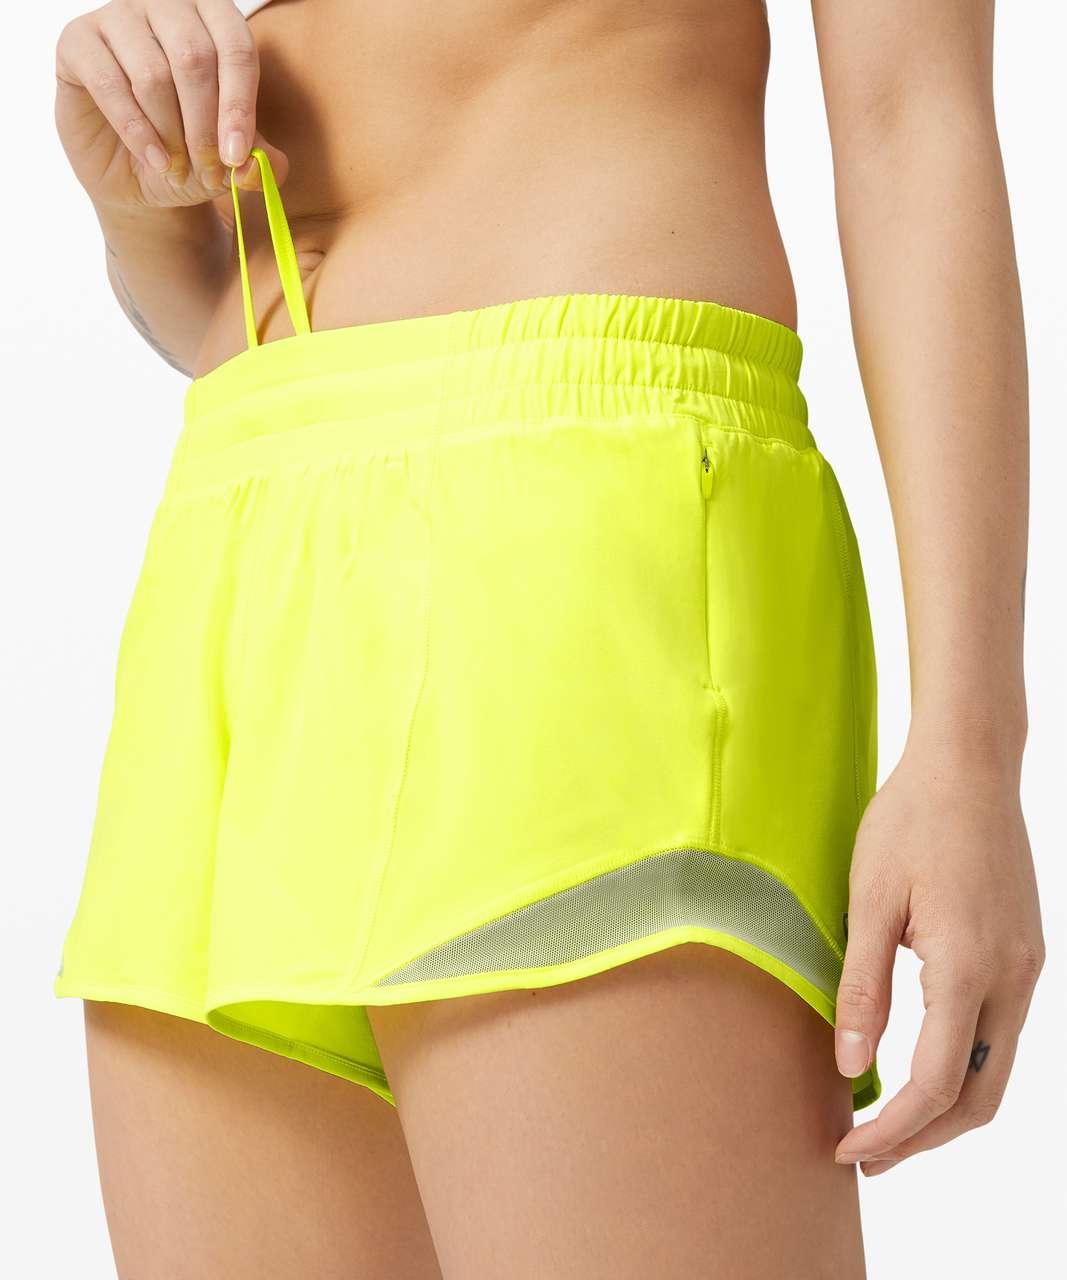 "Lululemon Hotty Hot Short II *Long 4"" - Highlight Yellow"